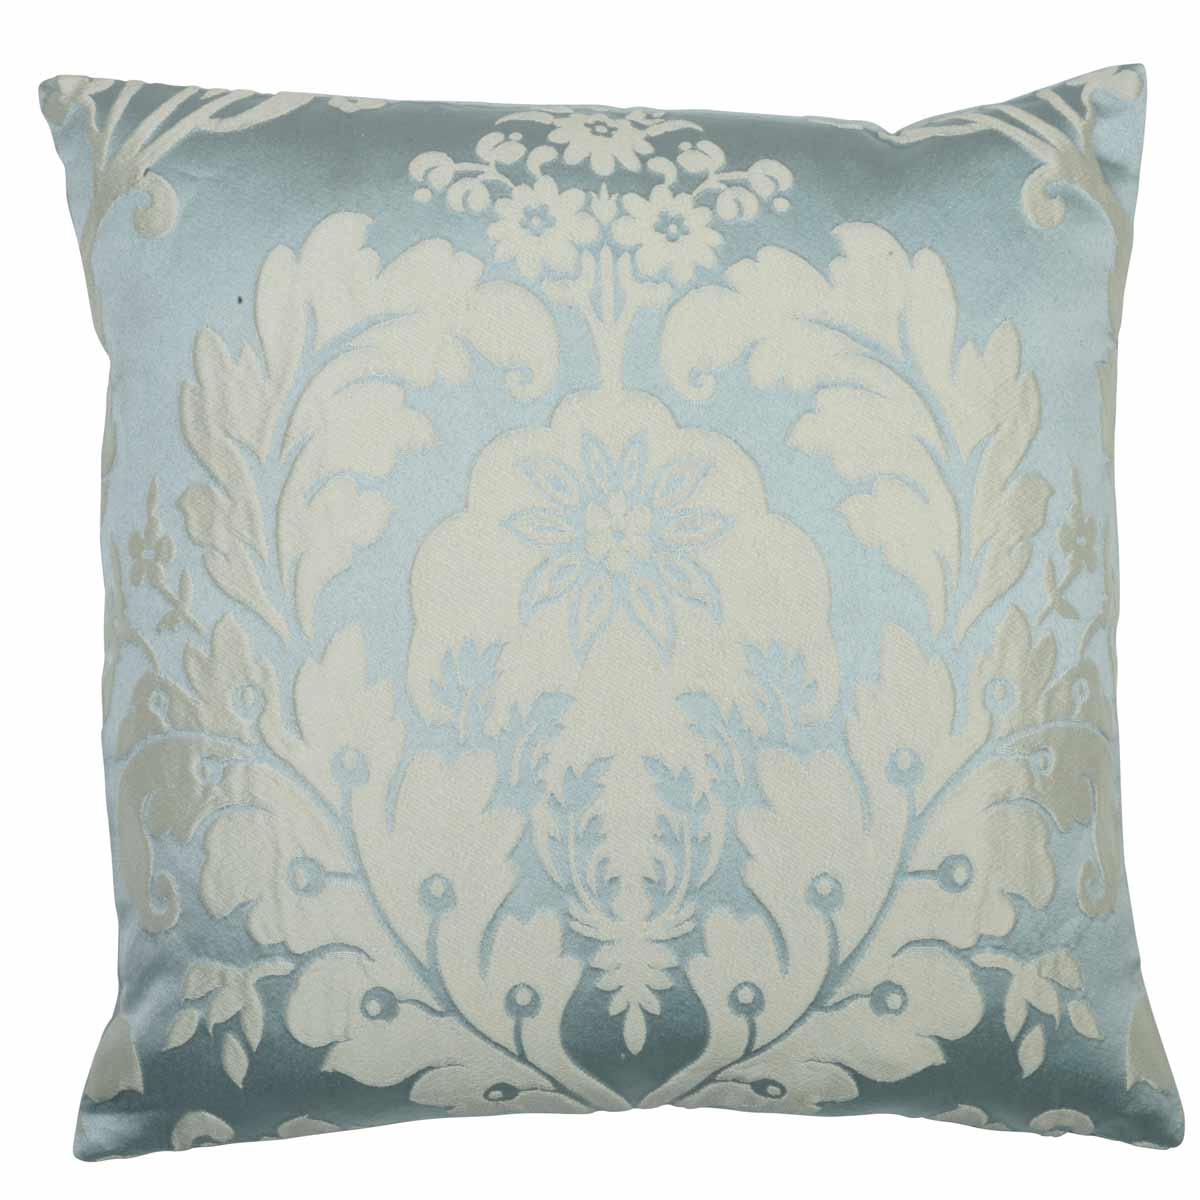 Buy Cheap Duck Egg Blue Bedding Compare Home Textiles